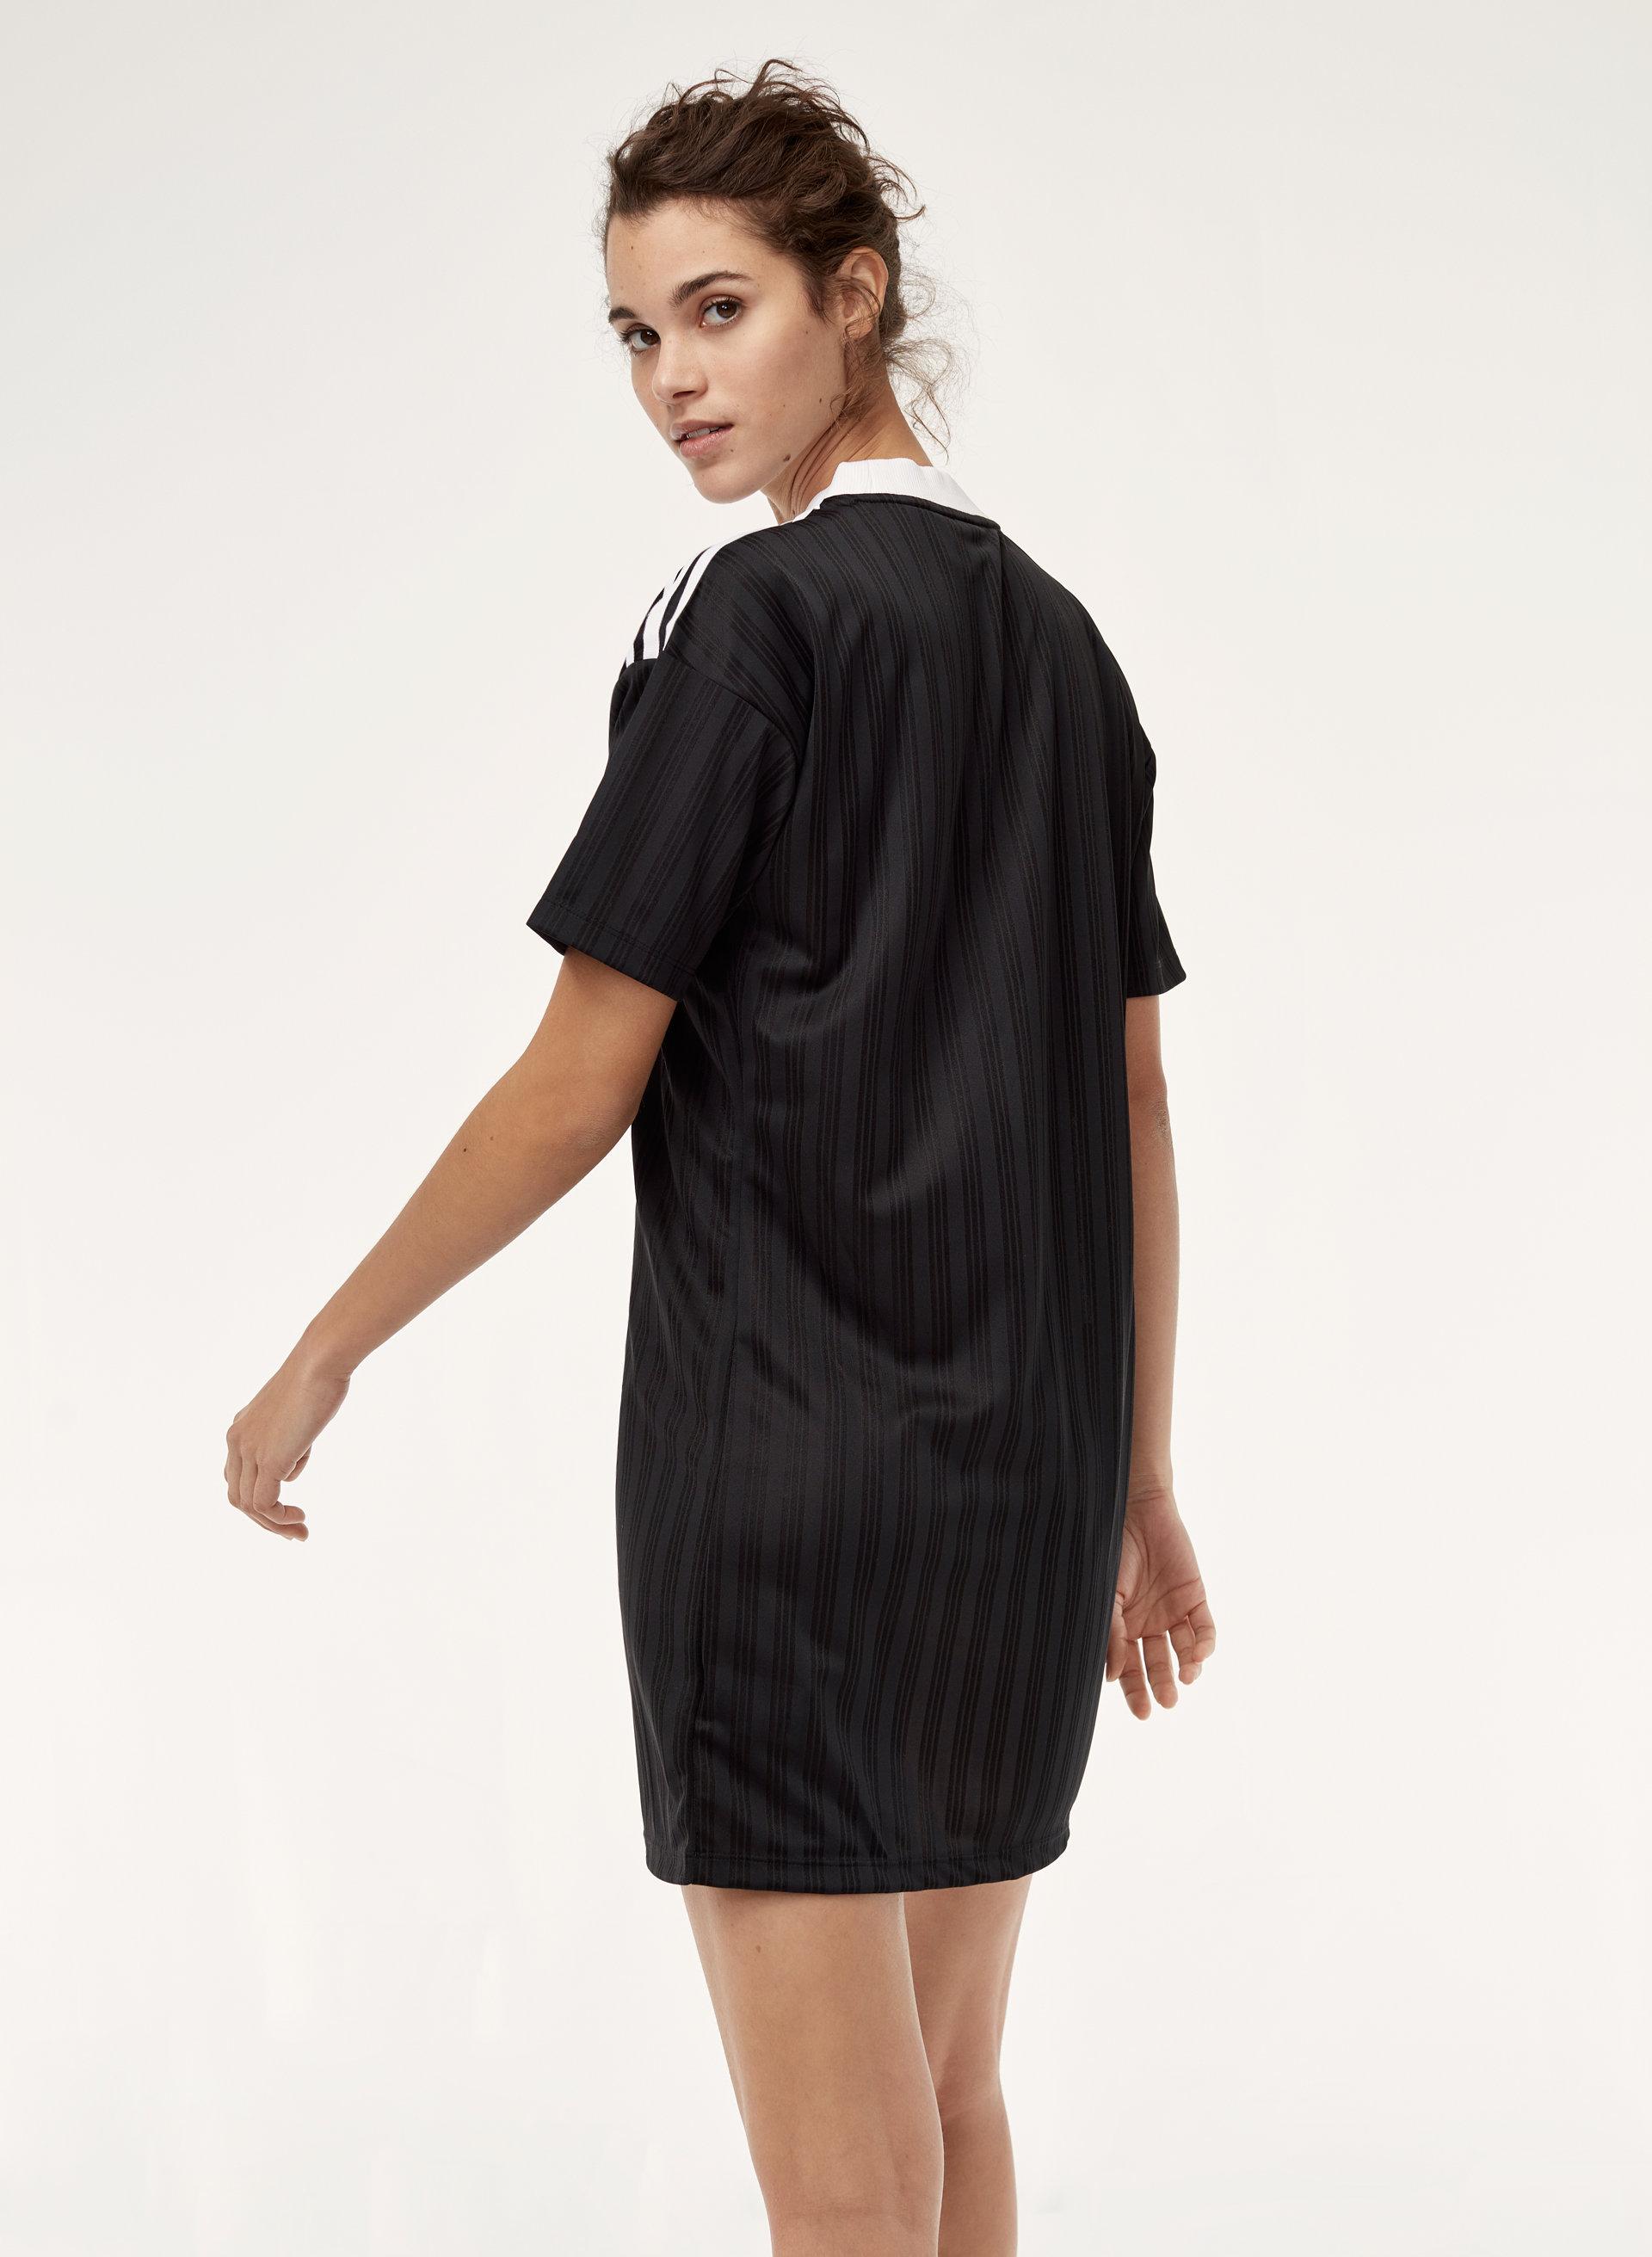 85f49e0687f4 ... adidas TREFOIL DRESS